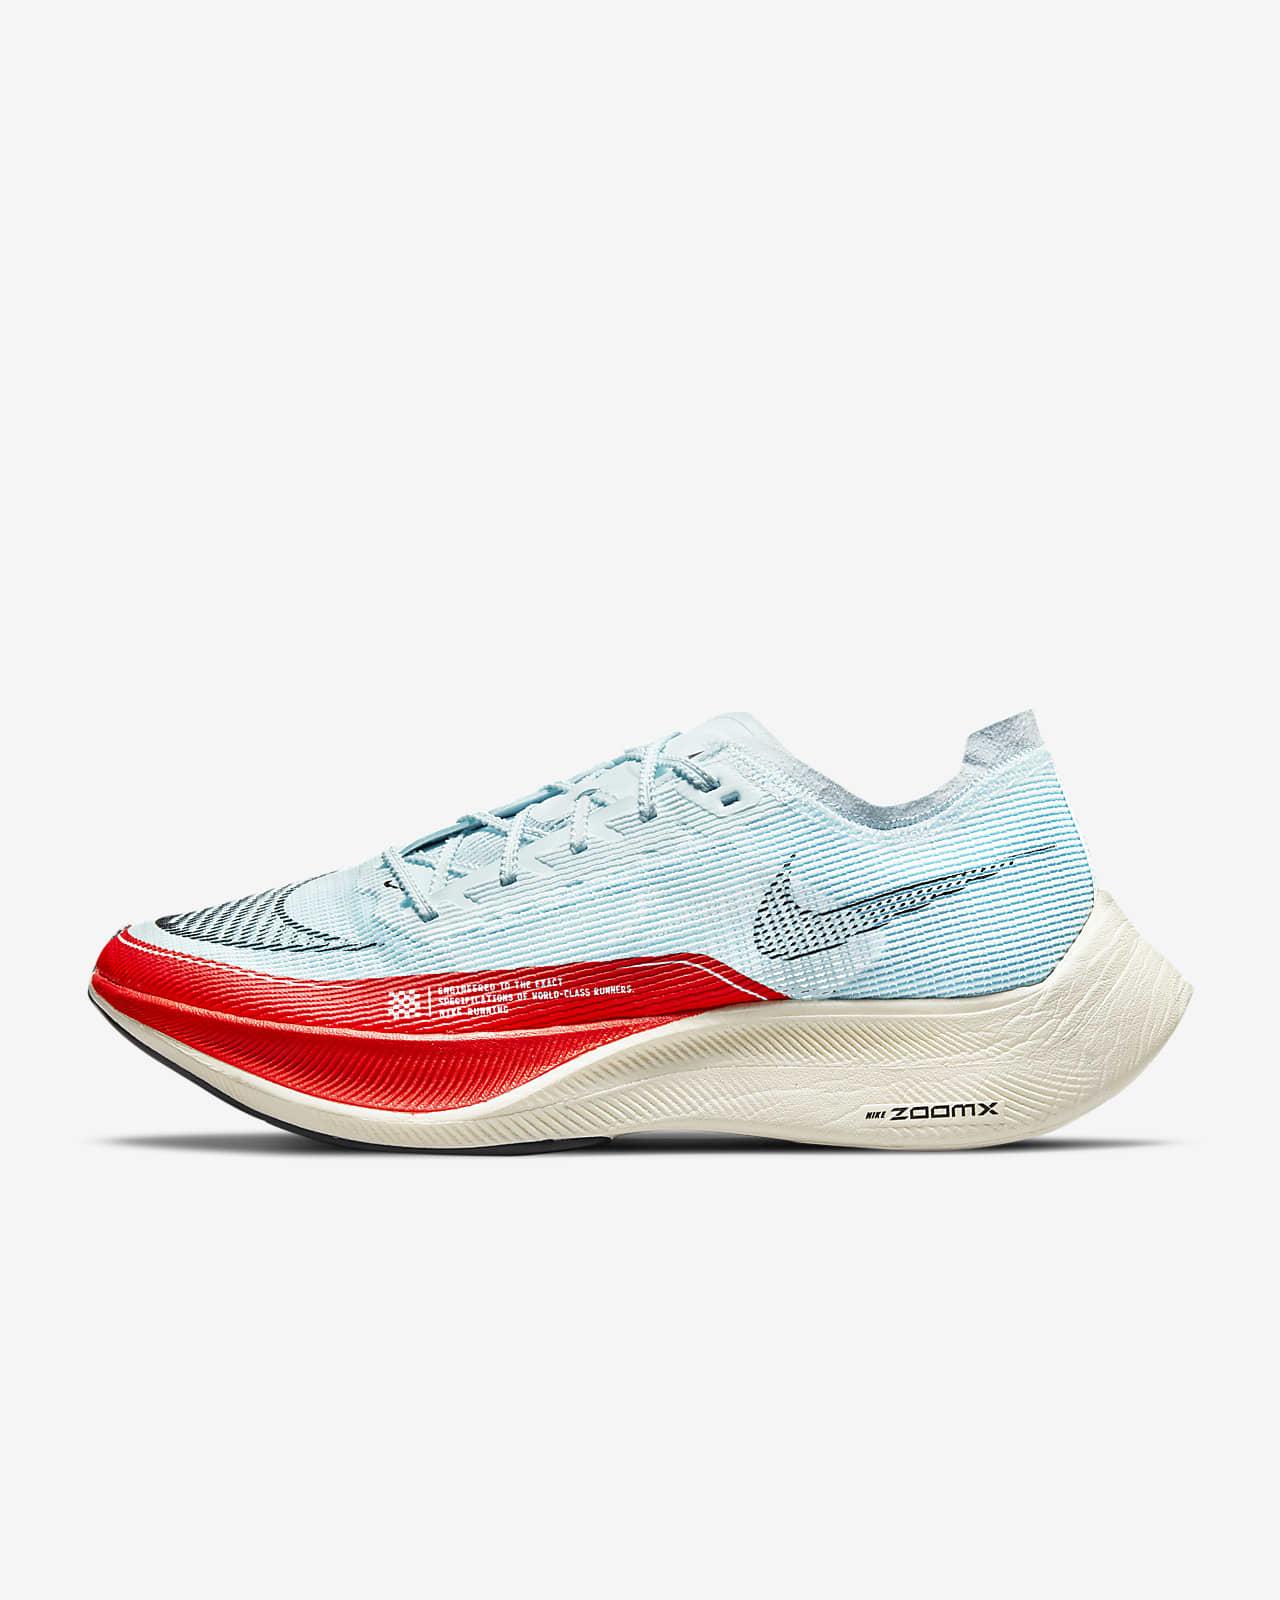 Nike ZoomX Vaporfly Next% 2 'OG' Men's Racing Shoe